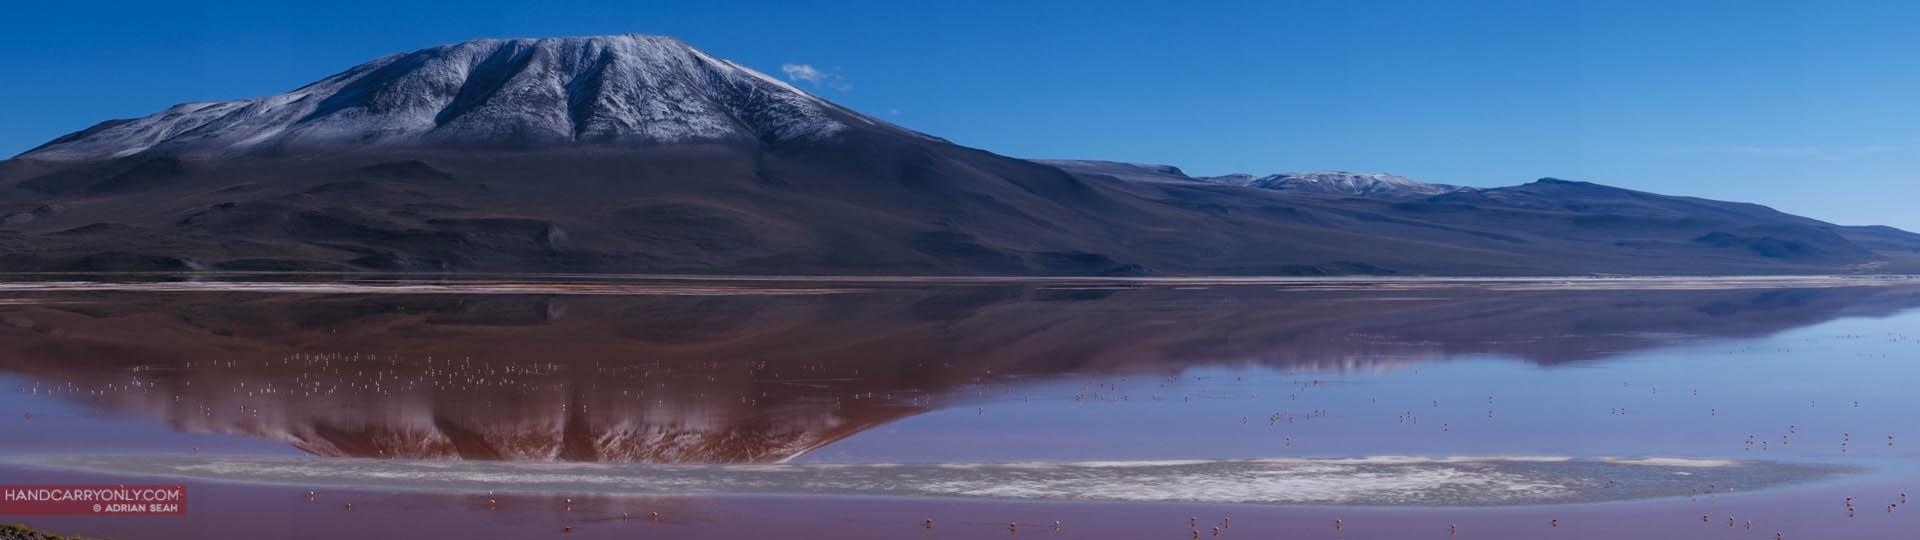 Laguna Colorada Bolivian Altiplano